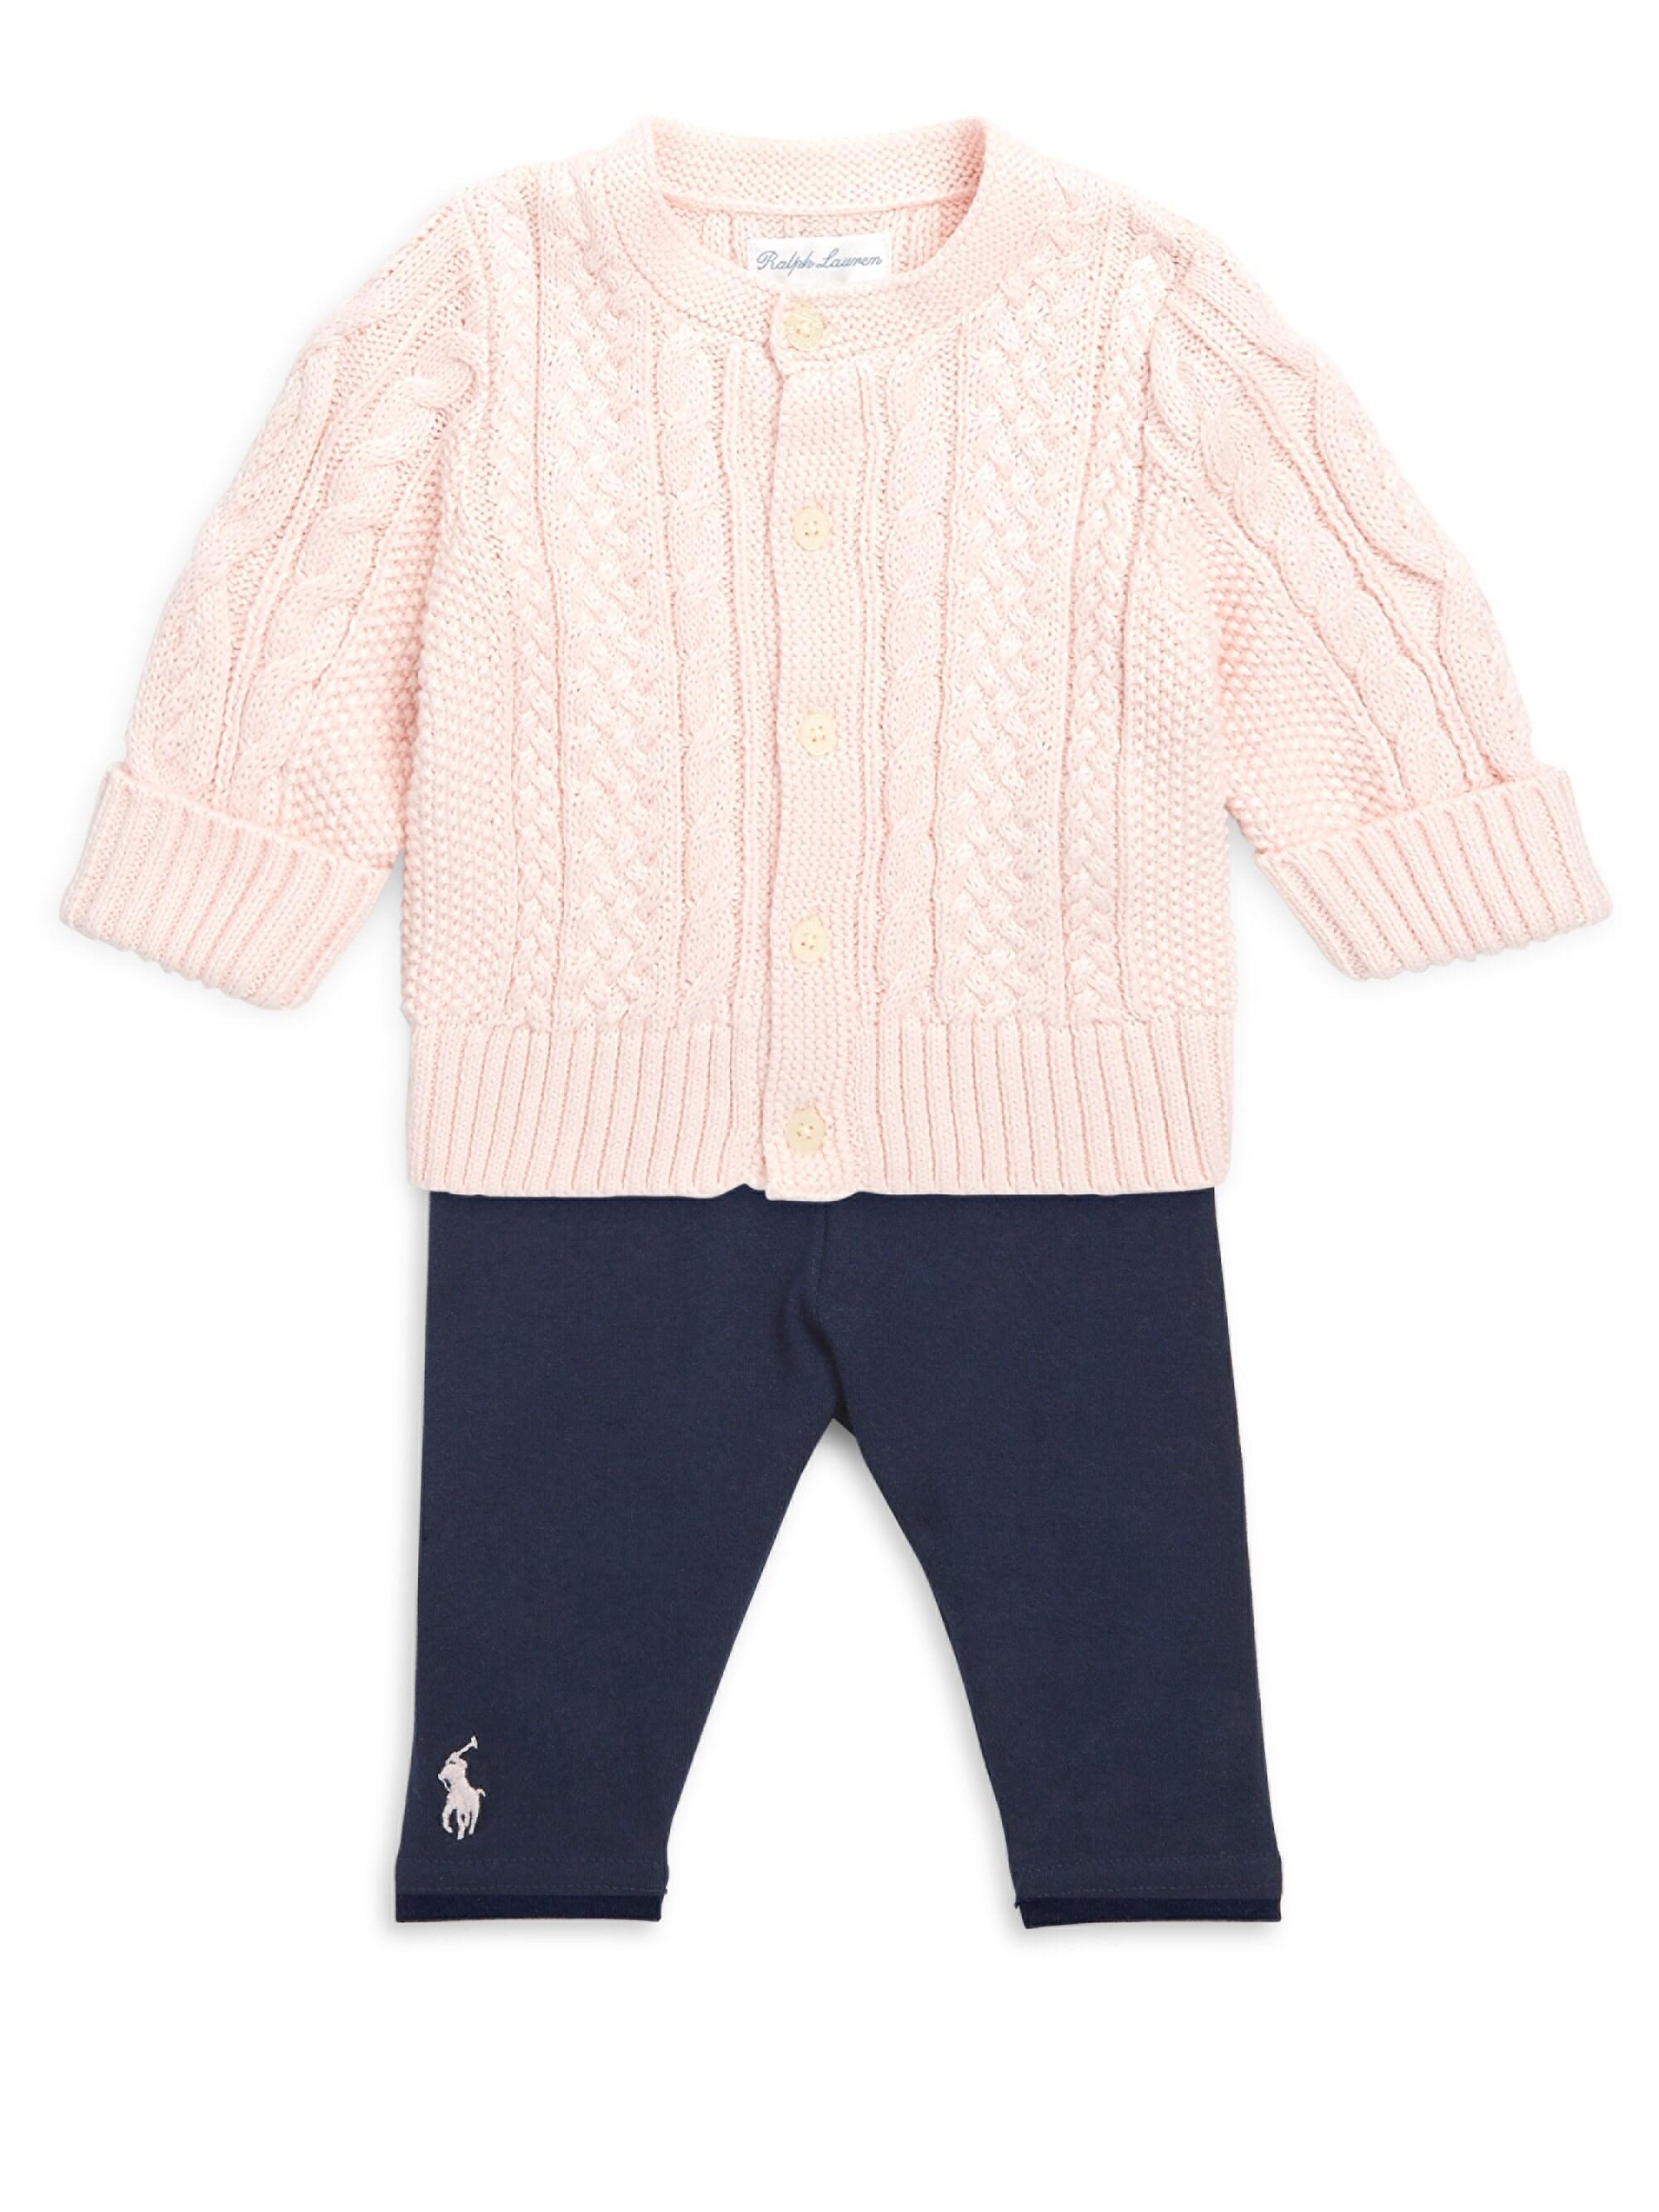 b9384b80a1 Ralph Lauren Baby Girl's Aran-knit Cardigan - Pink in Pink - Lyst